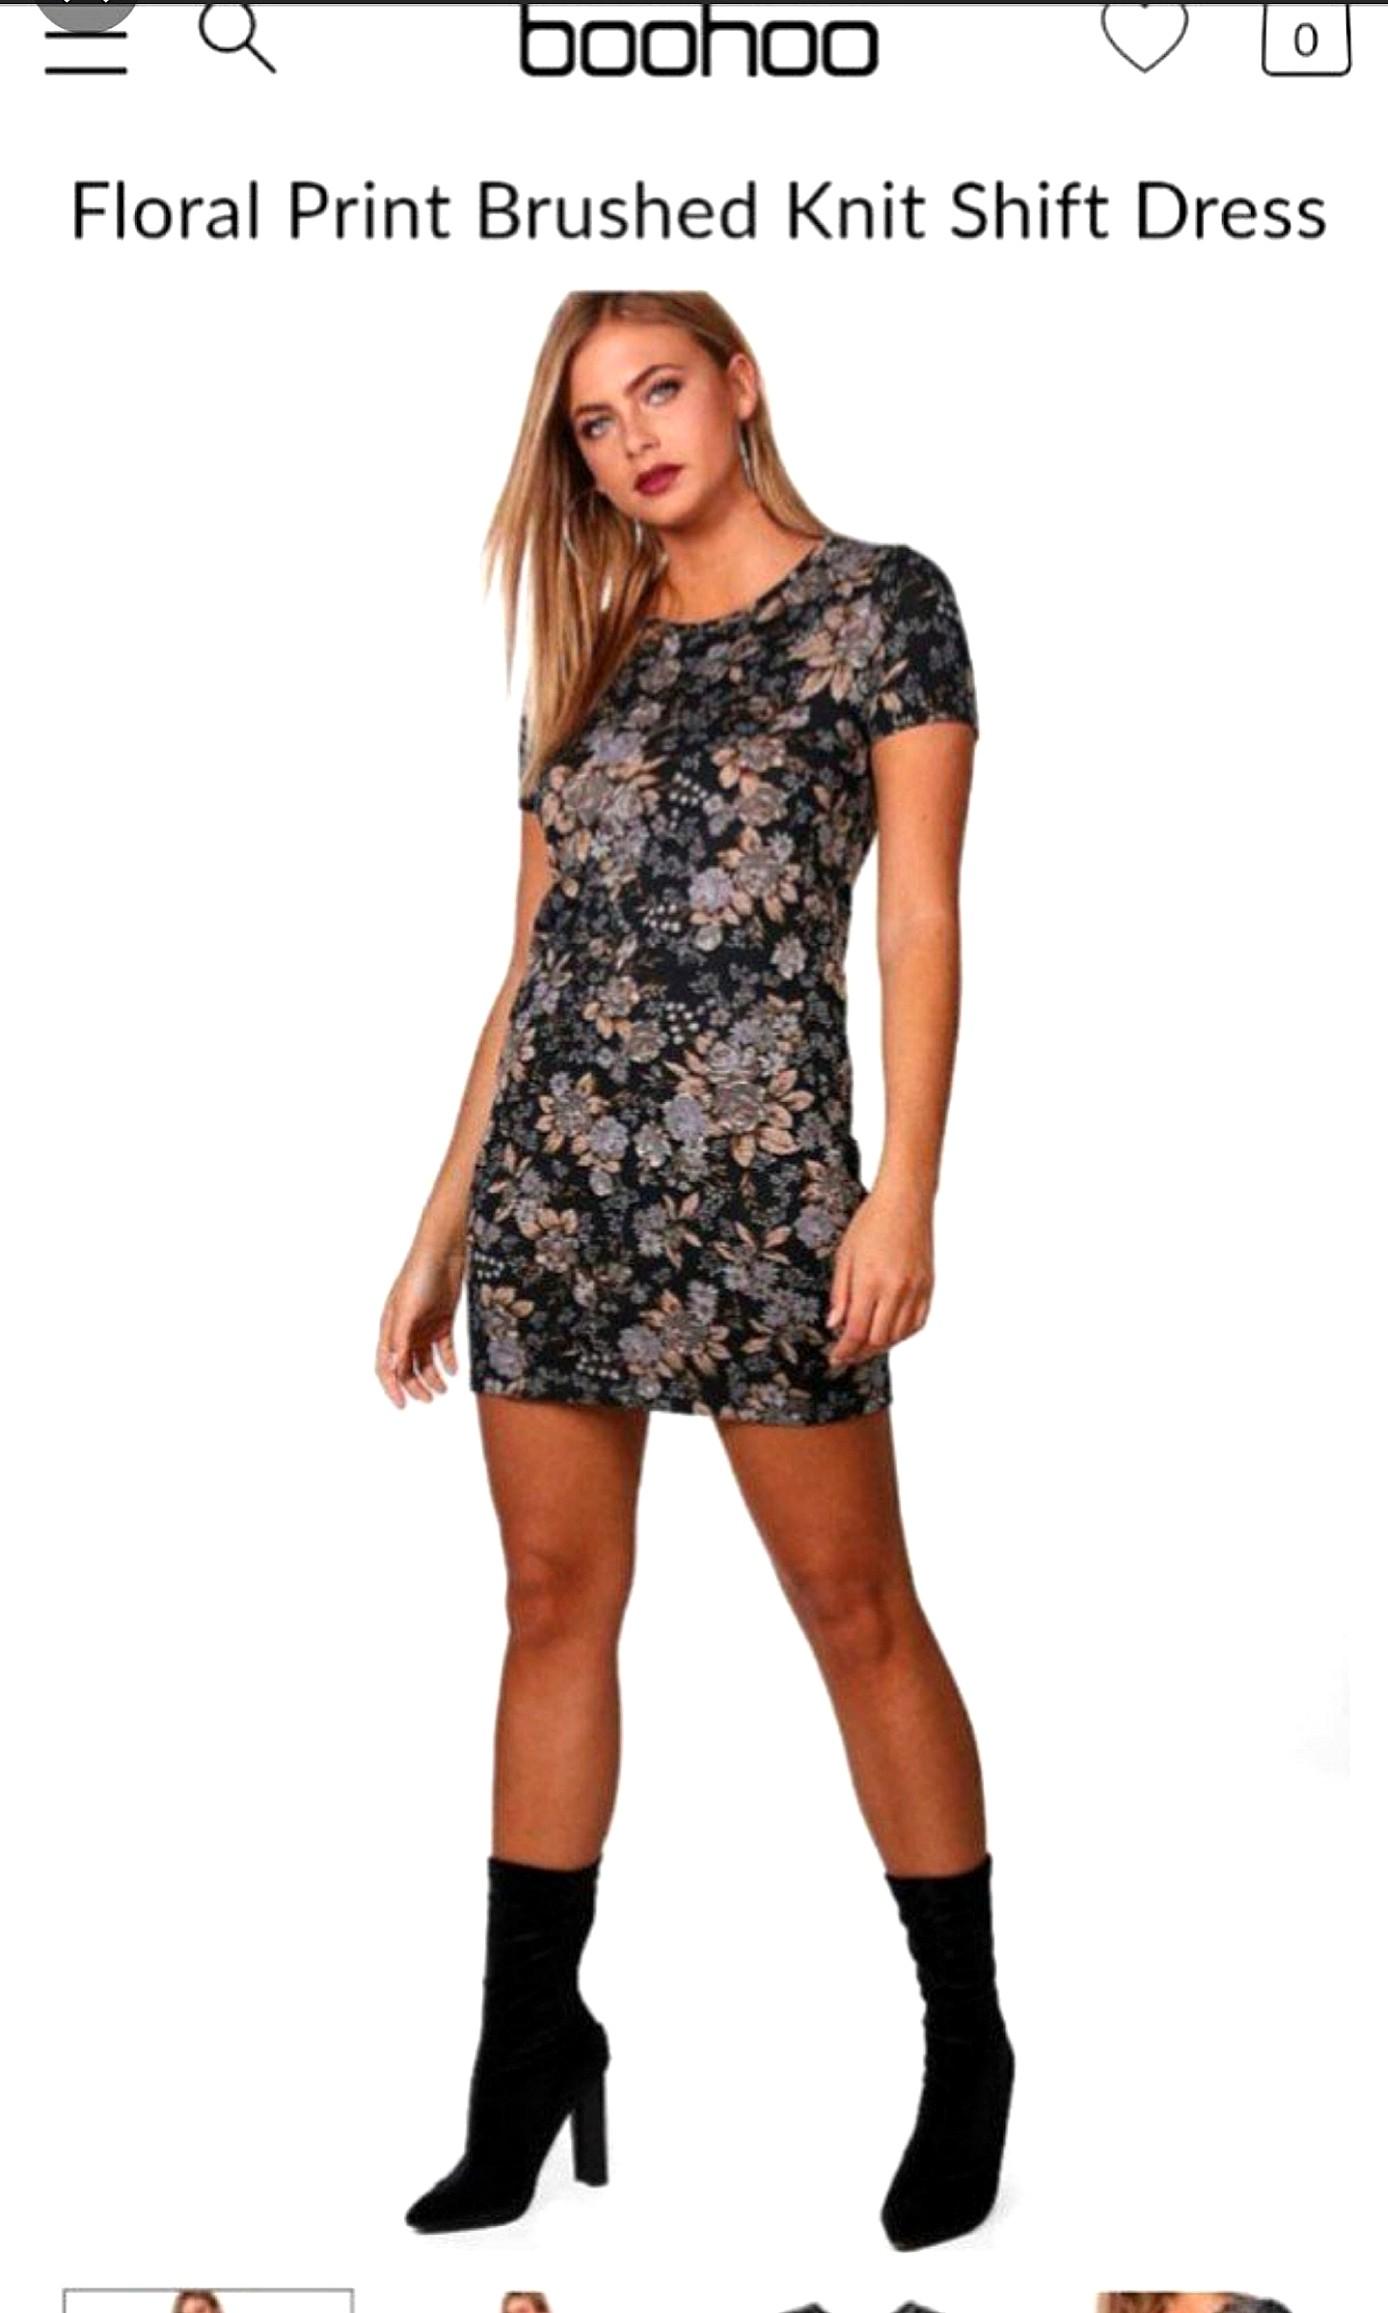 b8eac4e9e9a5 Boohoo Pretty Hayley Floral Print Brushed Knit Shift Dress asos ...